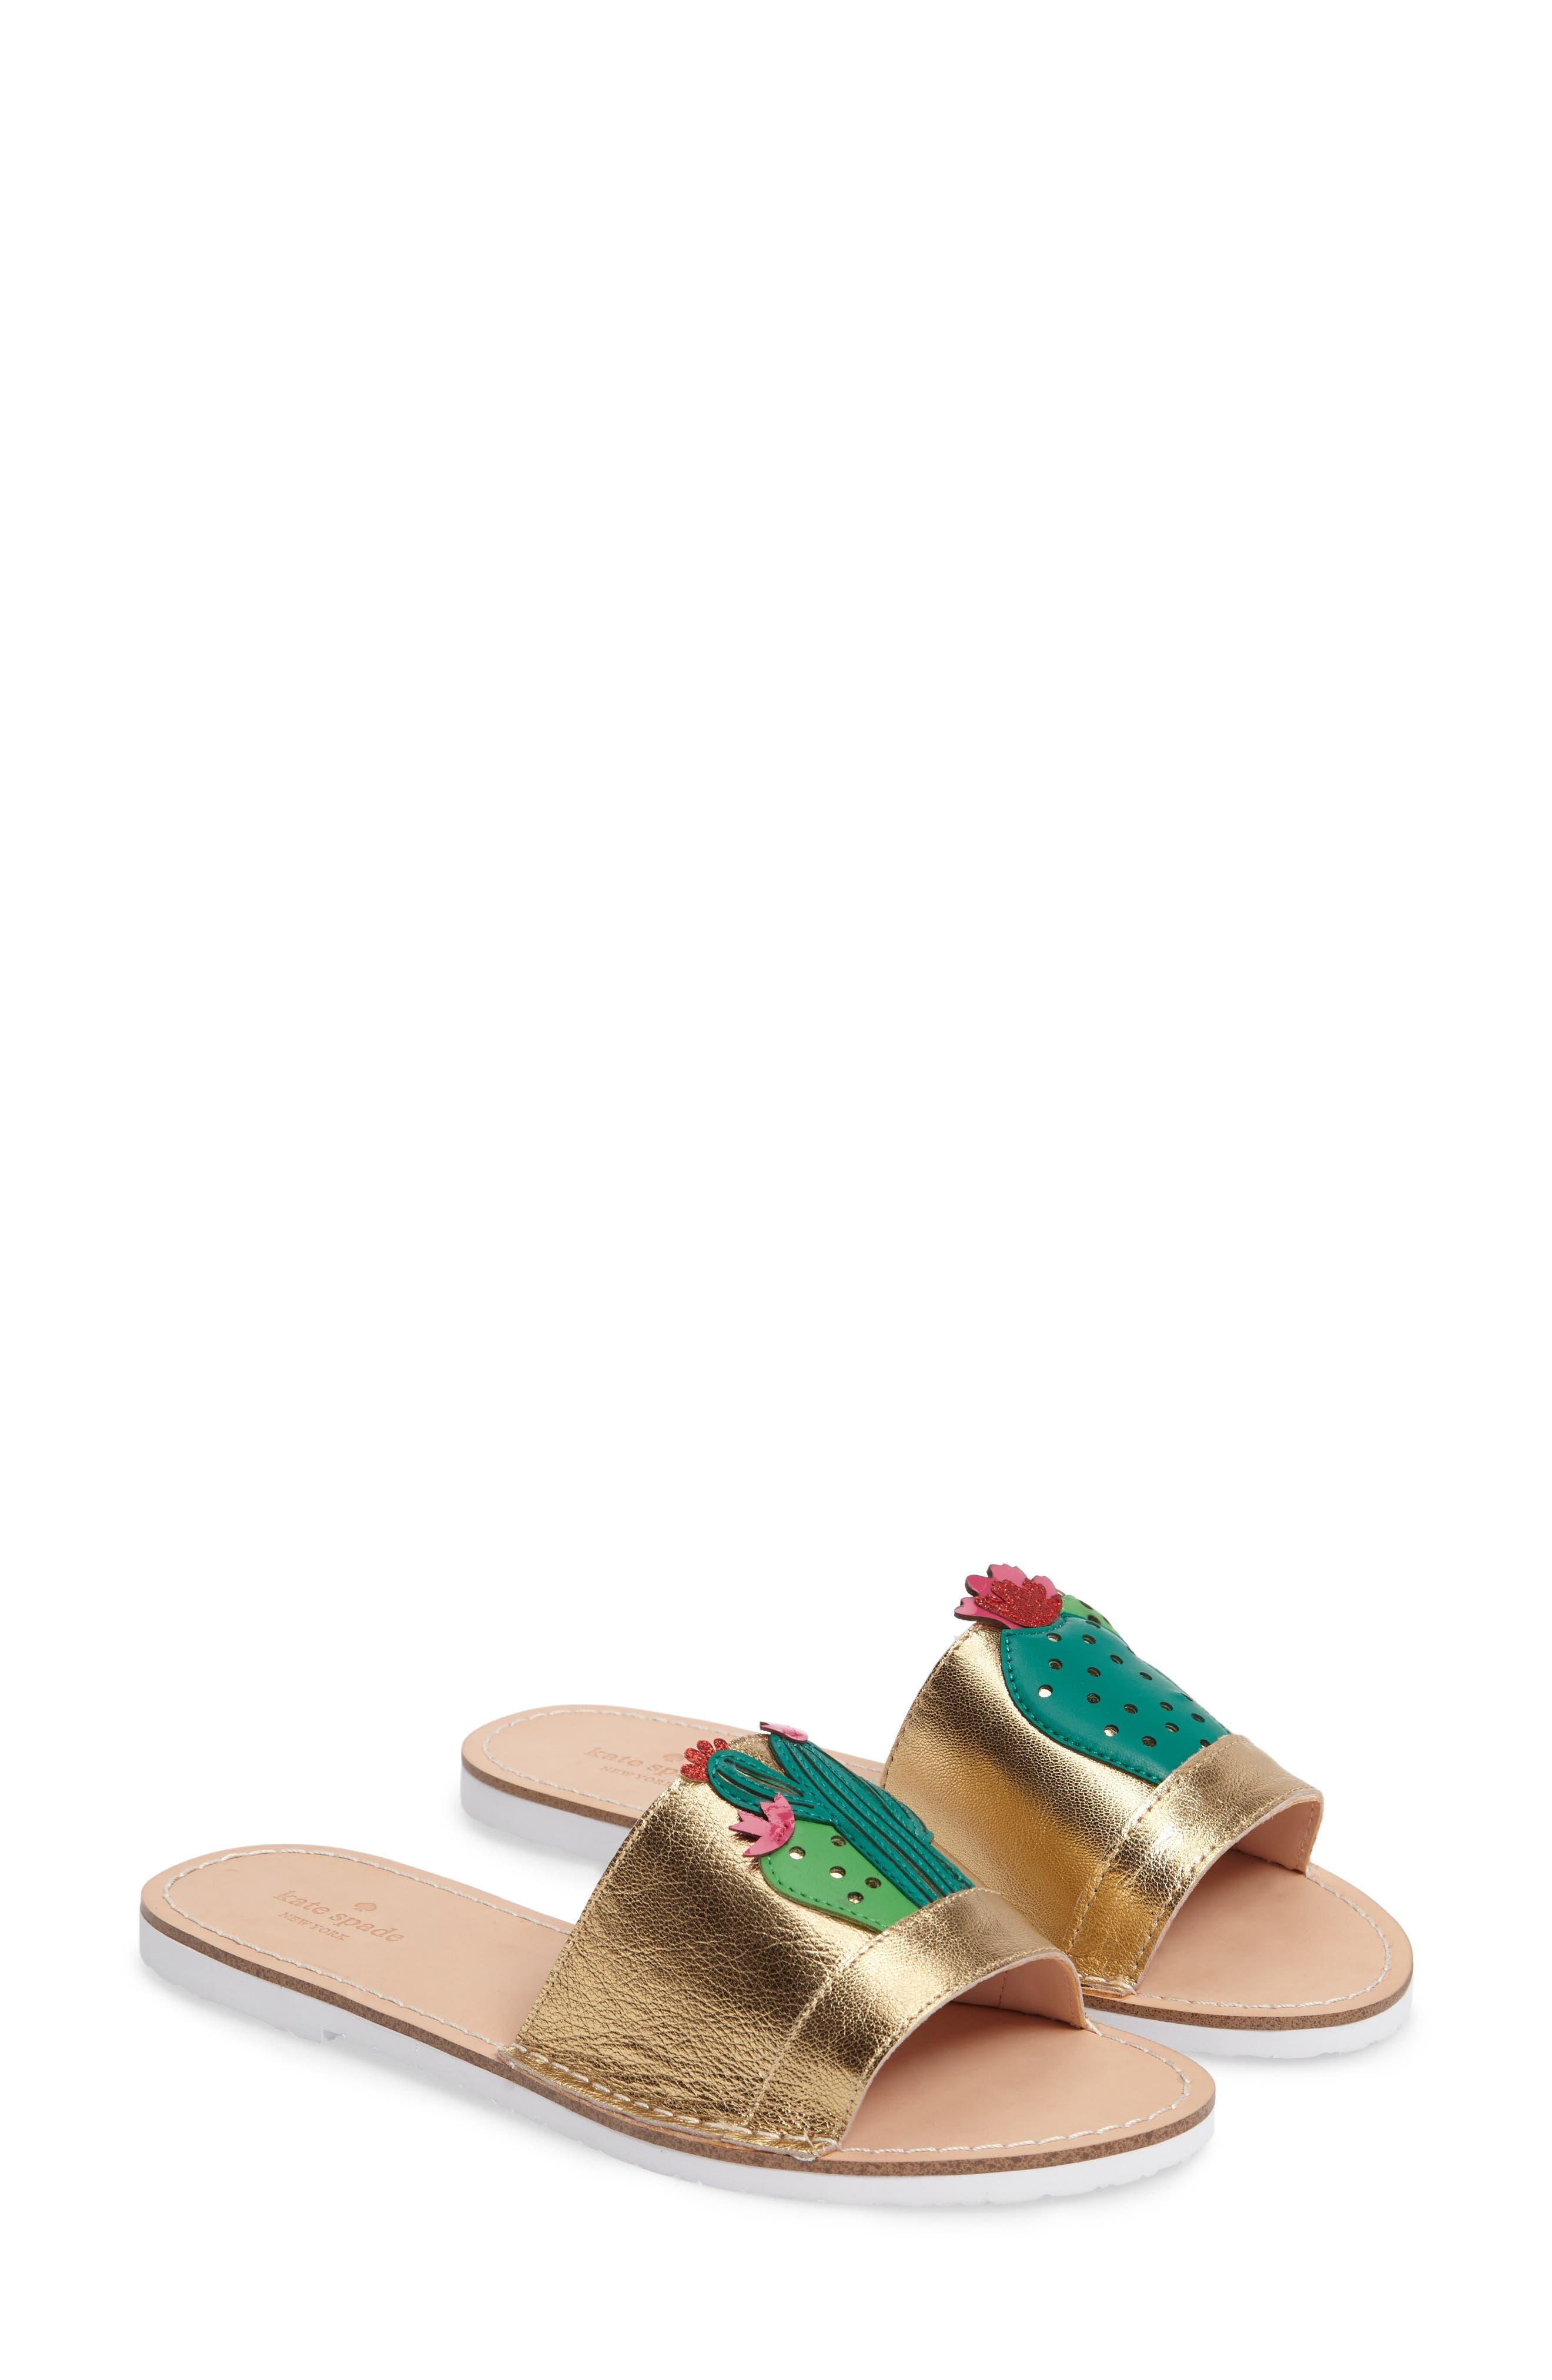 Main Image - kate spade new york iguana slide sandal (Women)